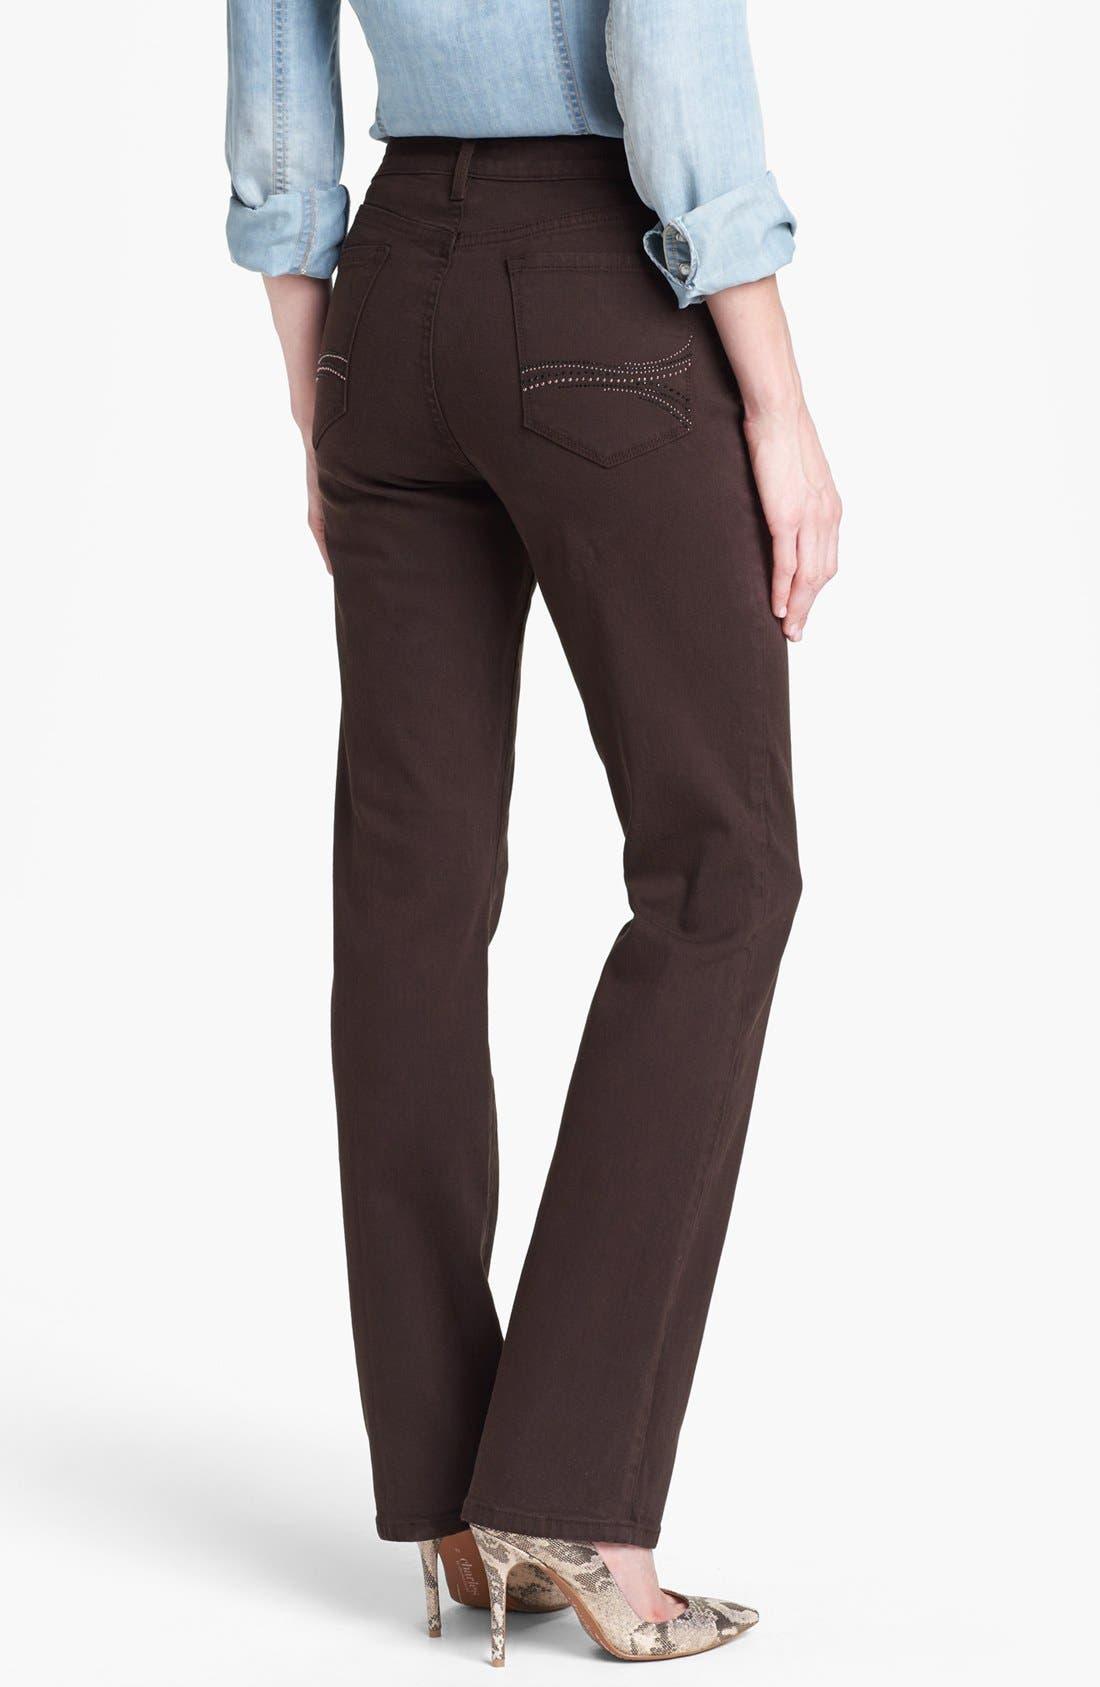 Alternate Image 3  - NYDJ 'Marilyn' Embellished Pocket Stretch Straight Leg Jeans (Ganache) (Regular & Petite)